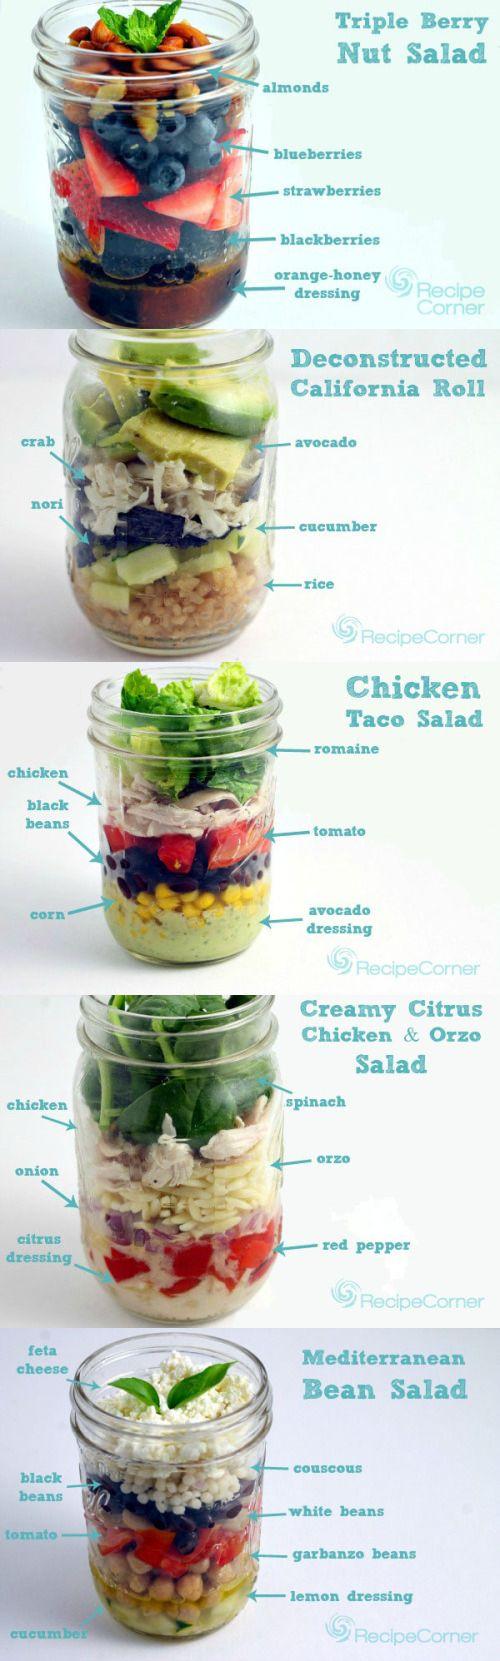 5 Affordable Mason Jar Salads Under 500 Calories…RECIPES Pinterest @ jennyrossxo ♡